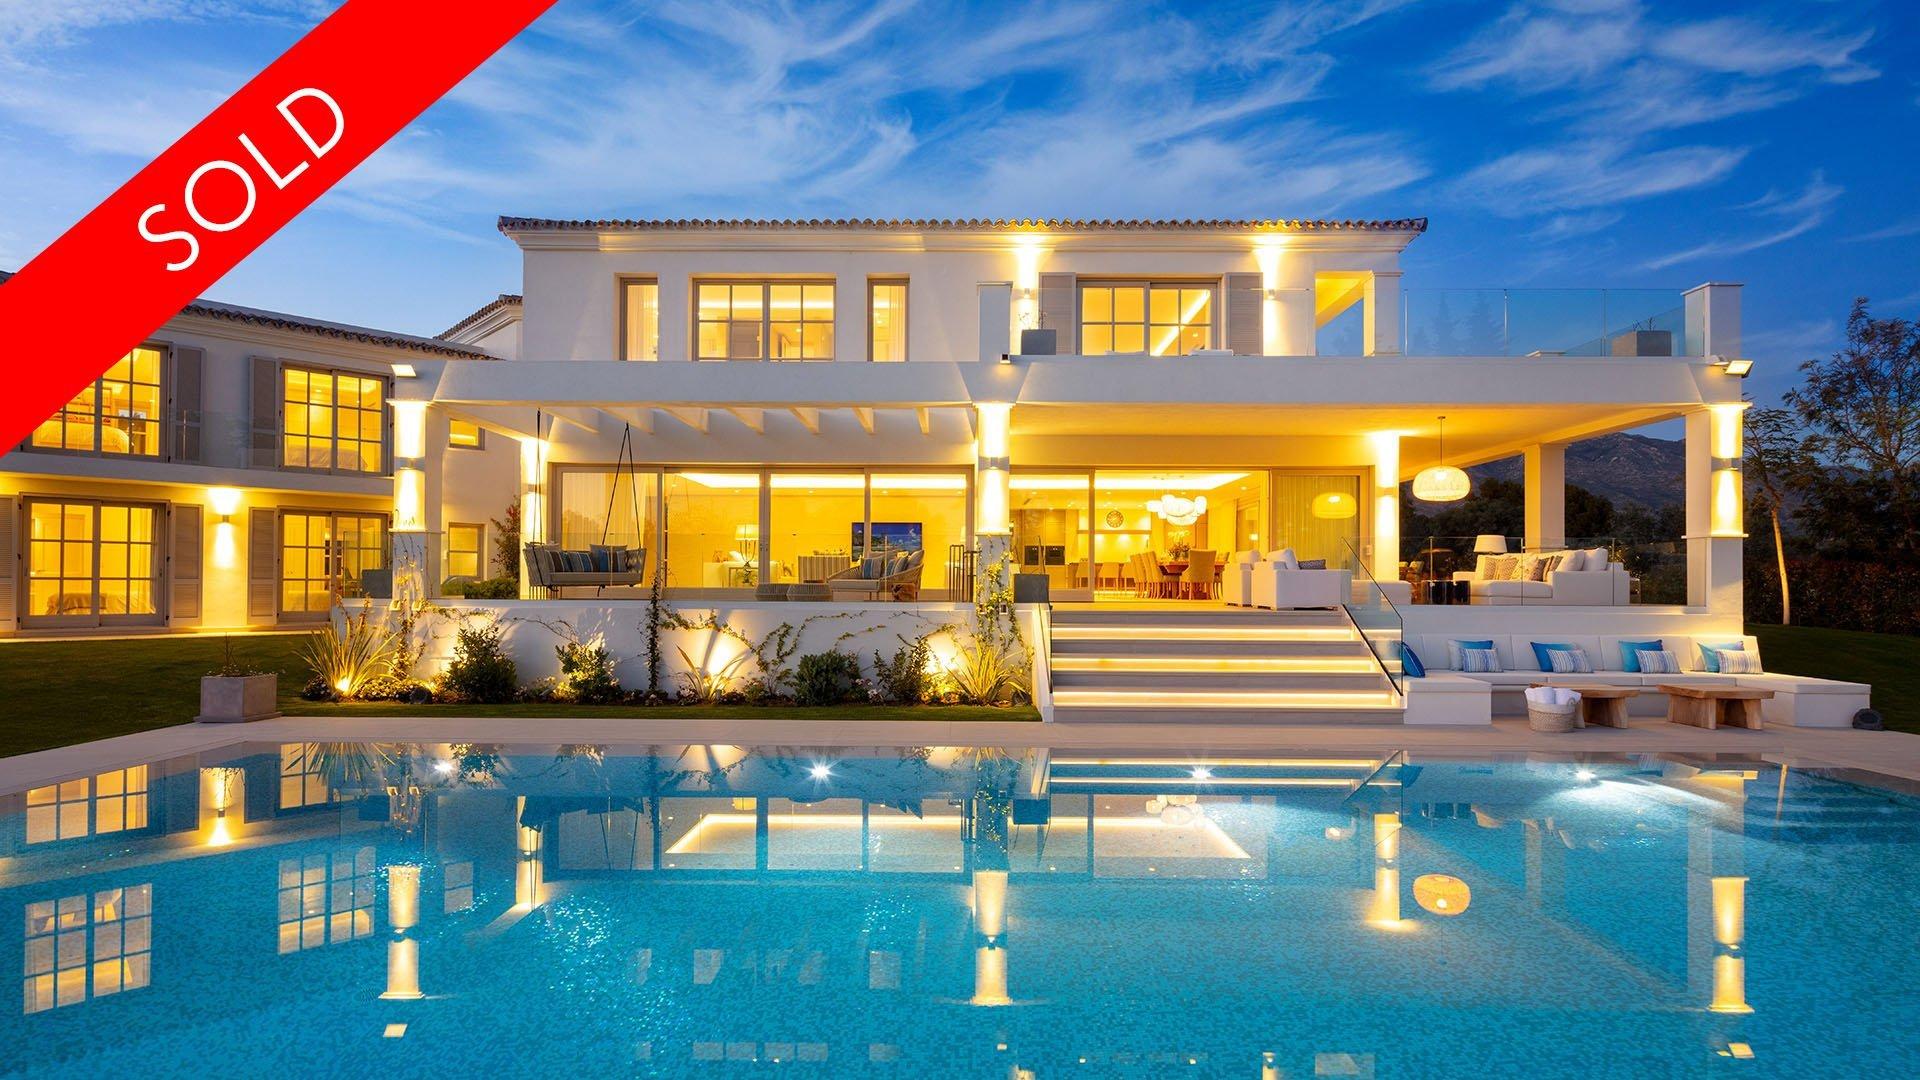 Aloha 40: Sensational luxury villa surrounded by the prestigious Aloha Golf in Marbella